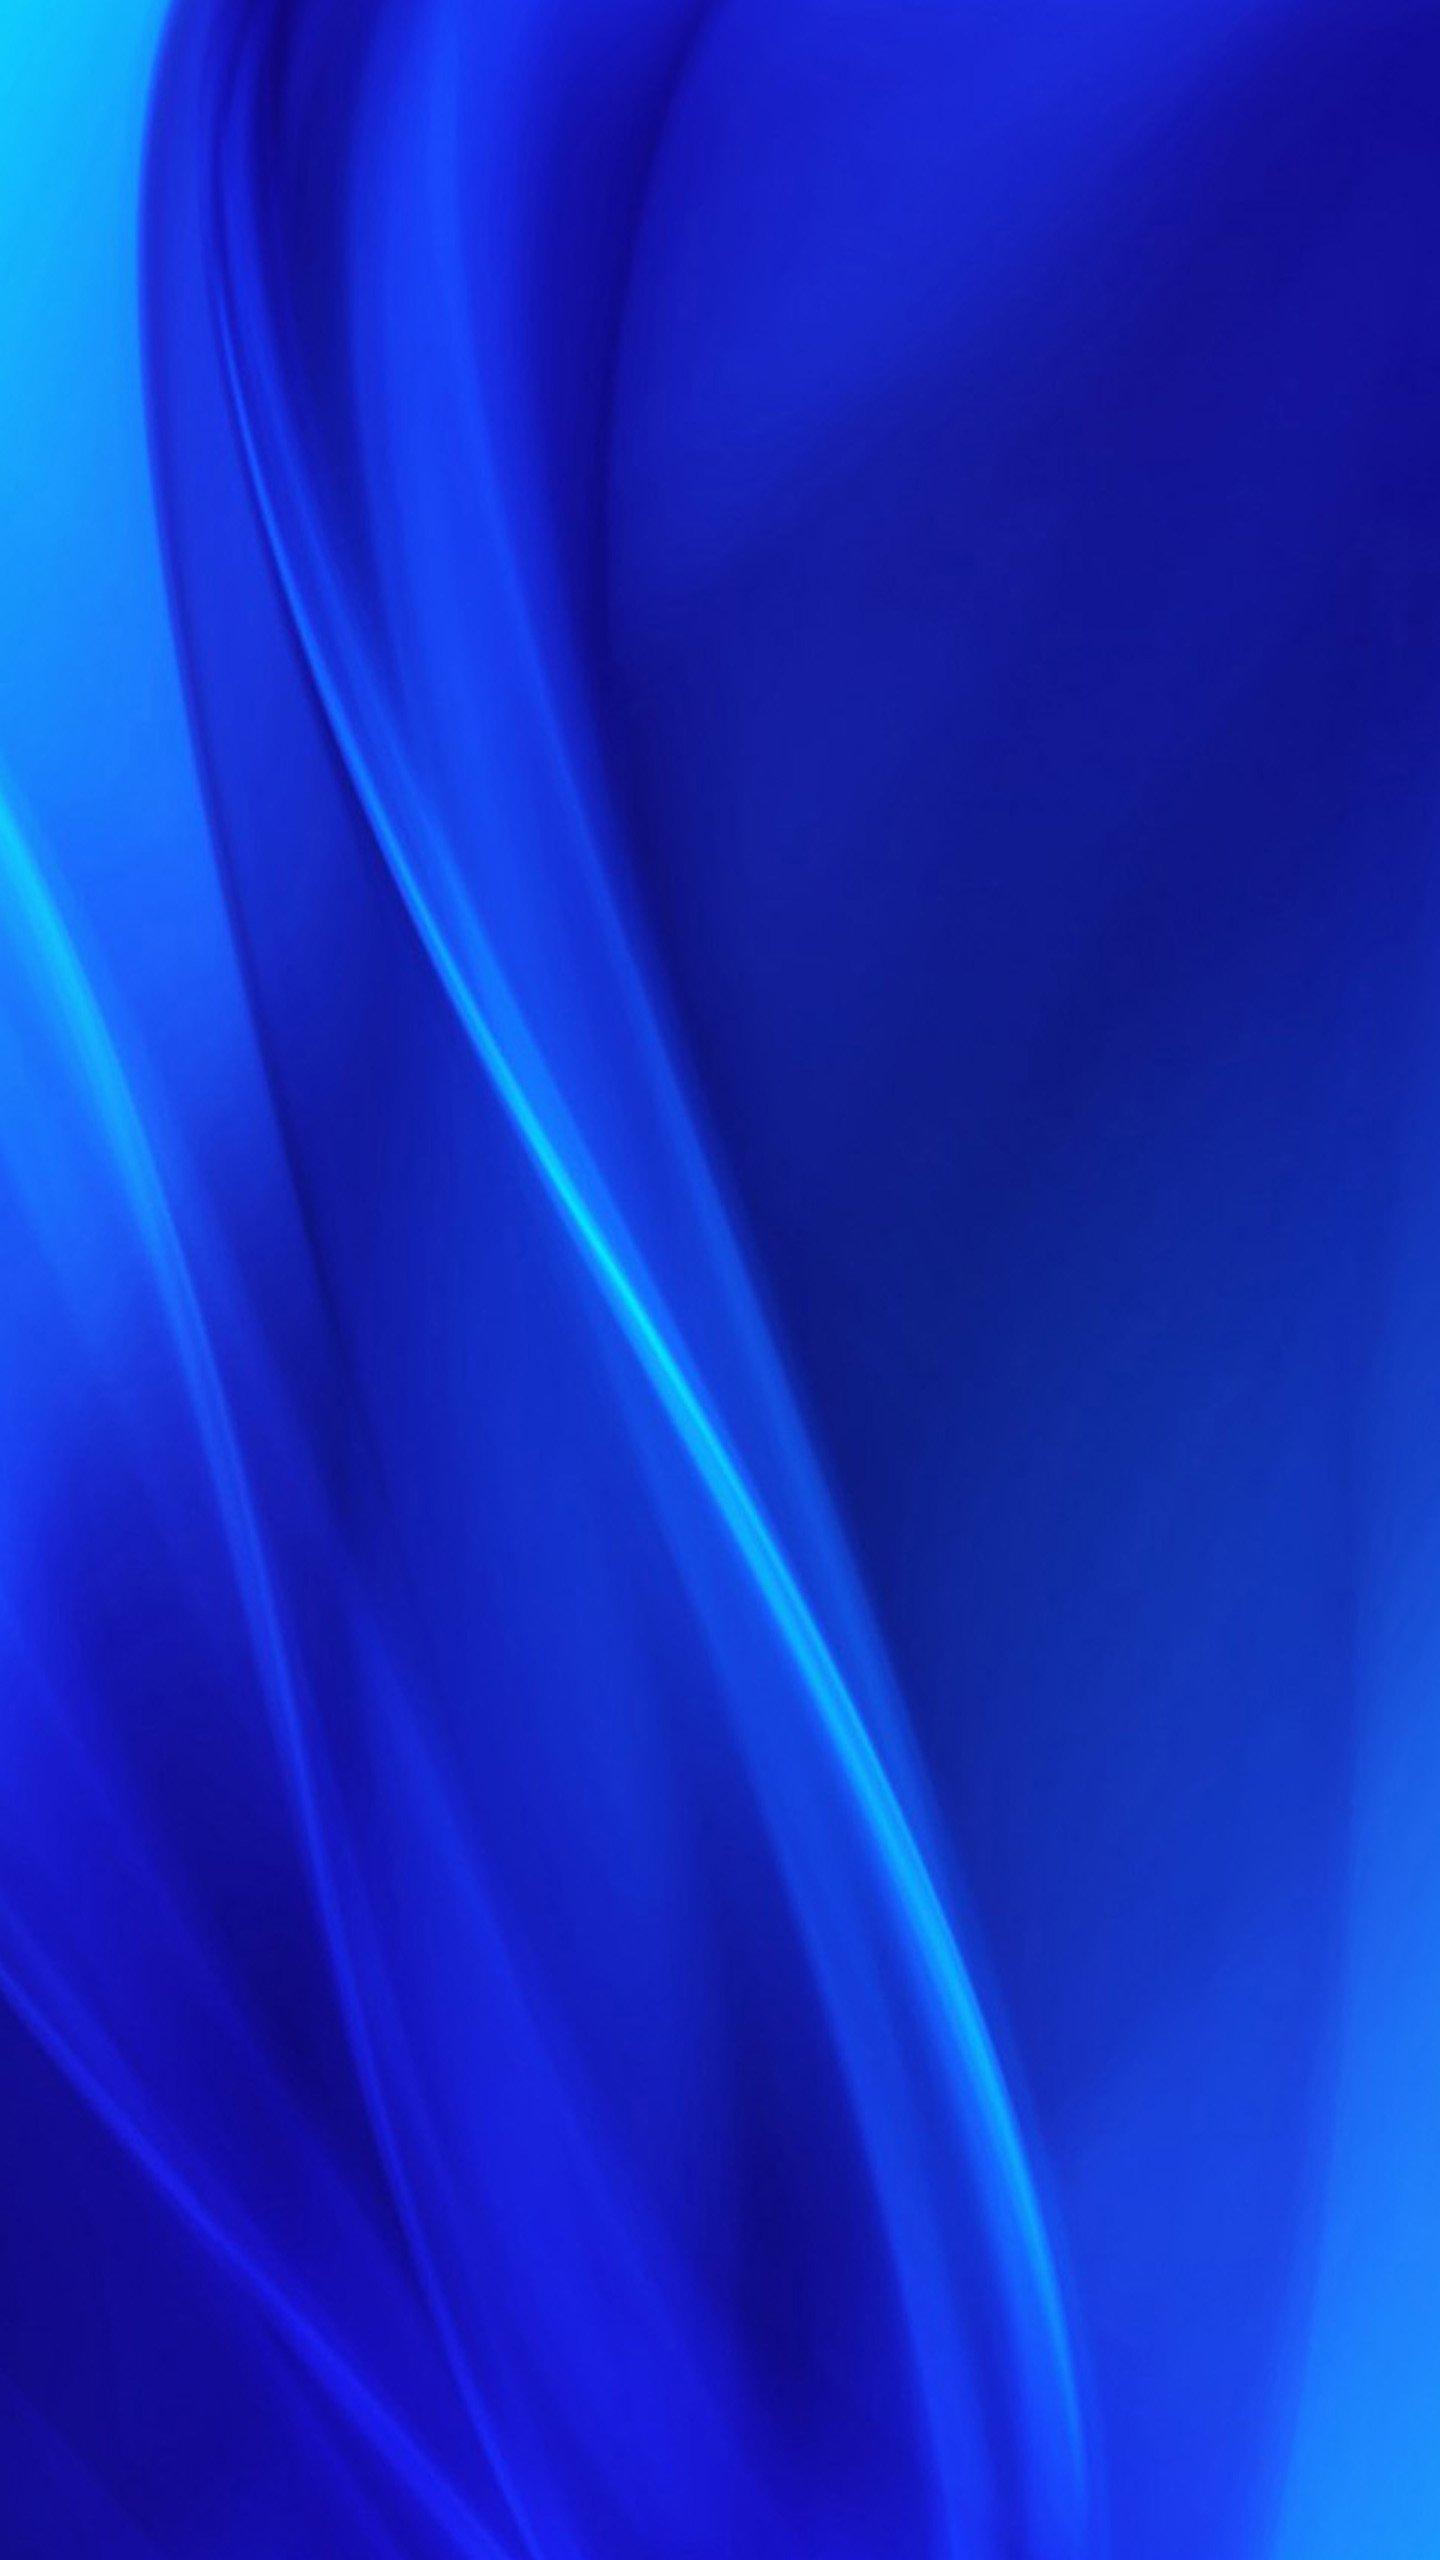 Abstract Samsung Galaxy S6 Wallpaper 176 Galaxy S6 1440x2560